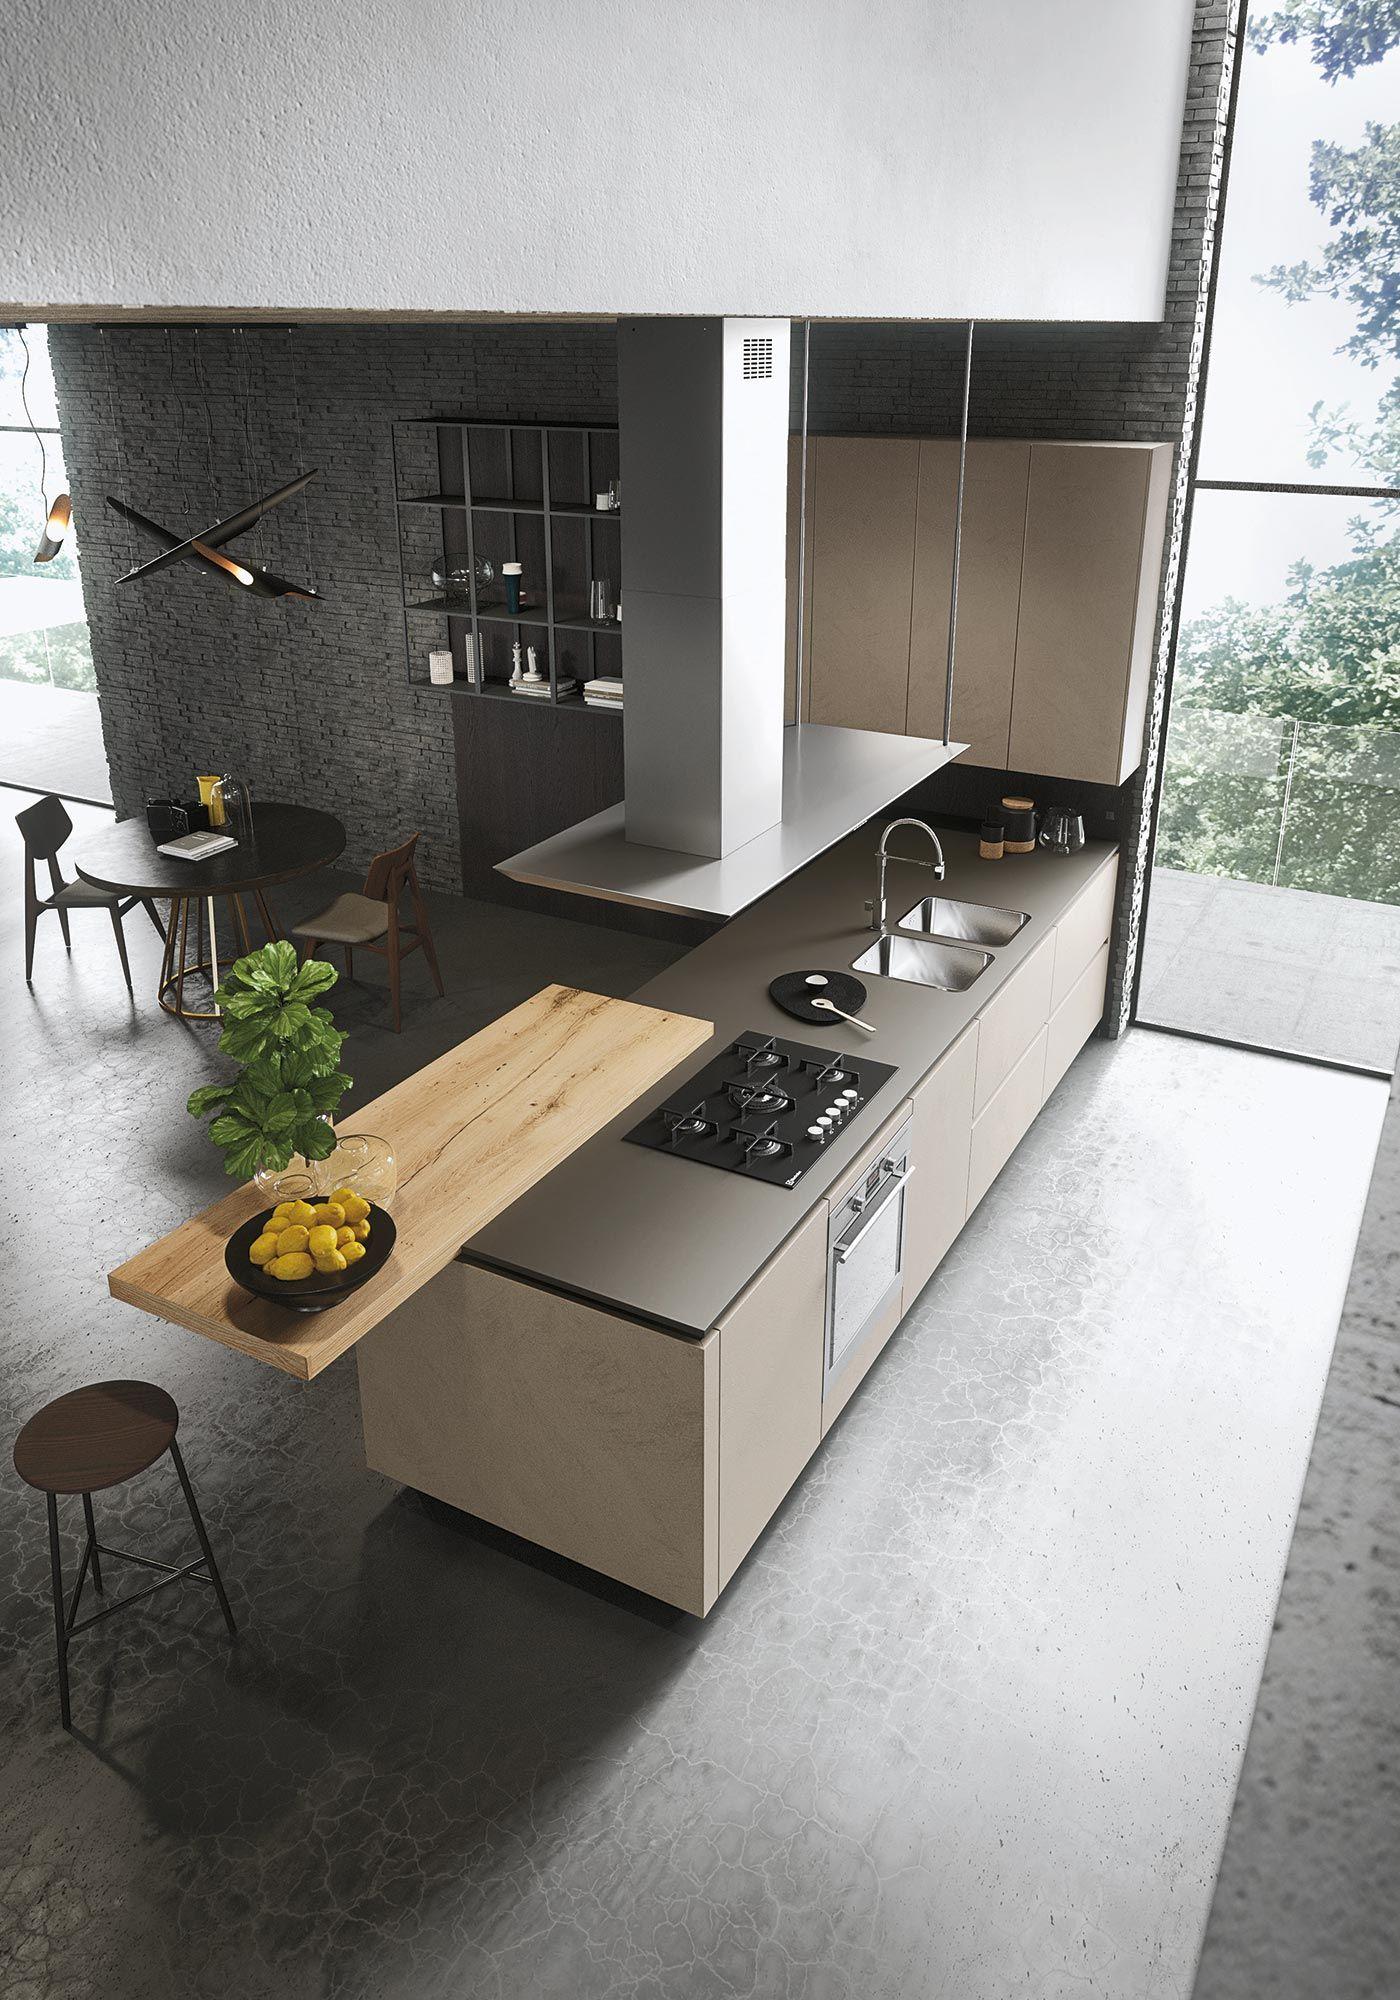 Cucina in legno con penisola look cucina in legno for Cucine moderne contemporanee